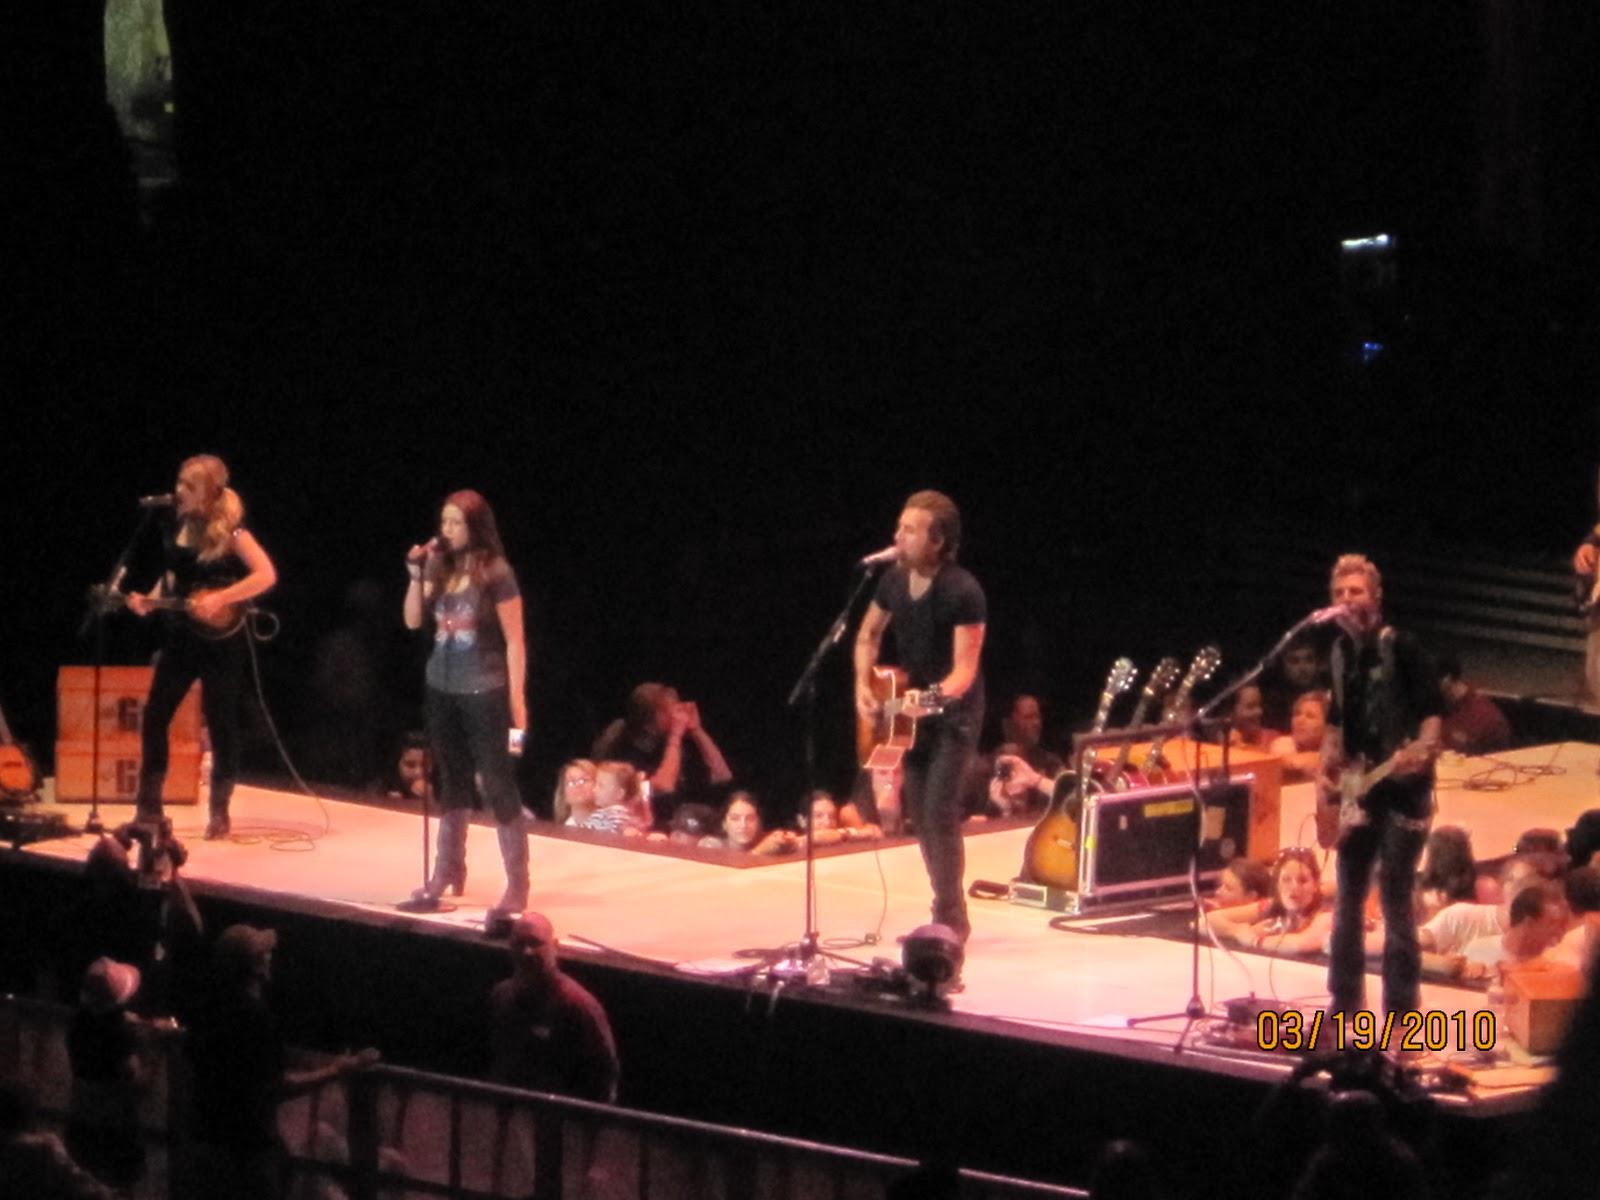 http://1.bp.blogspot.com/_zhQCIcpuWno/TMzsIqIp2TI/AAAAAAAAArs/NLurie0VFEo/s1600/Taylor+Swift+Concert+015.jpg